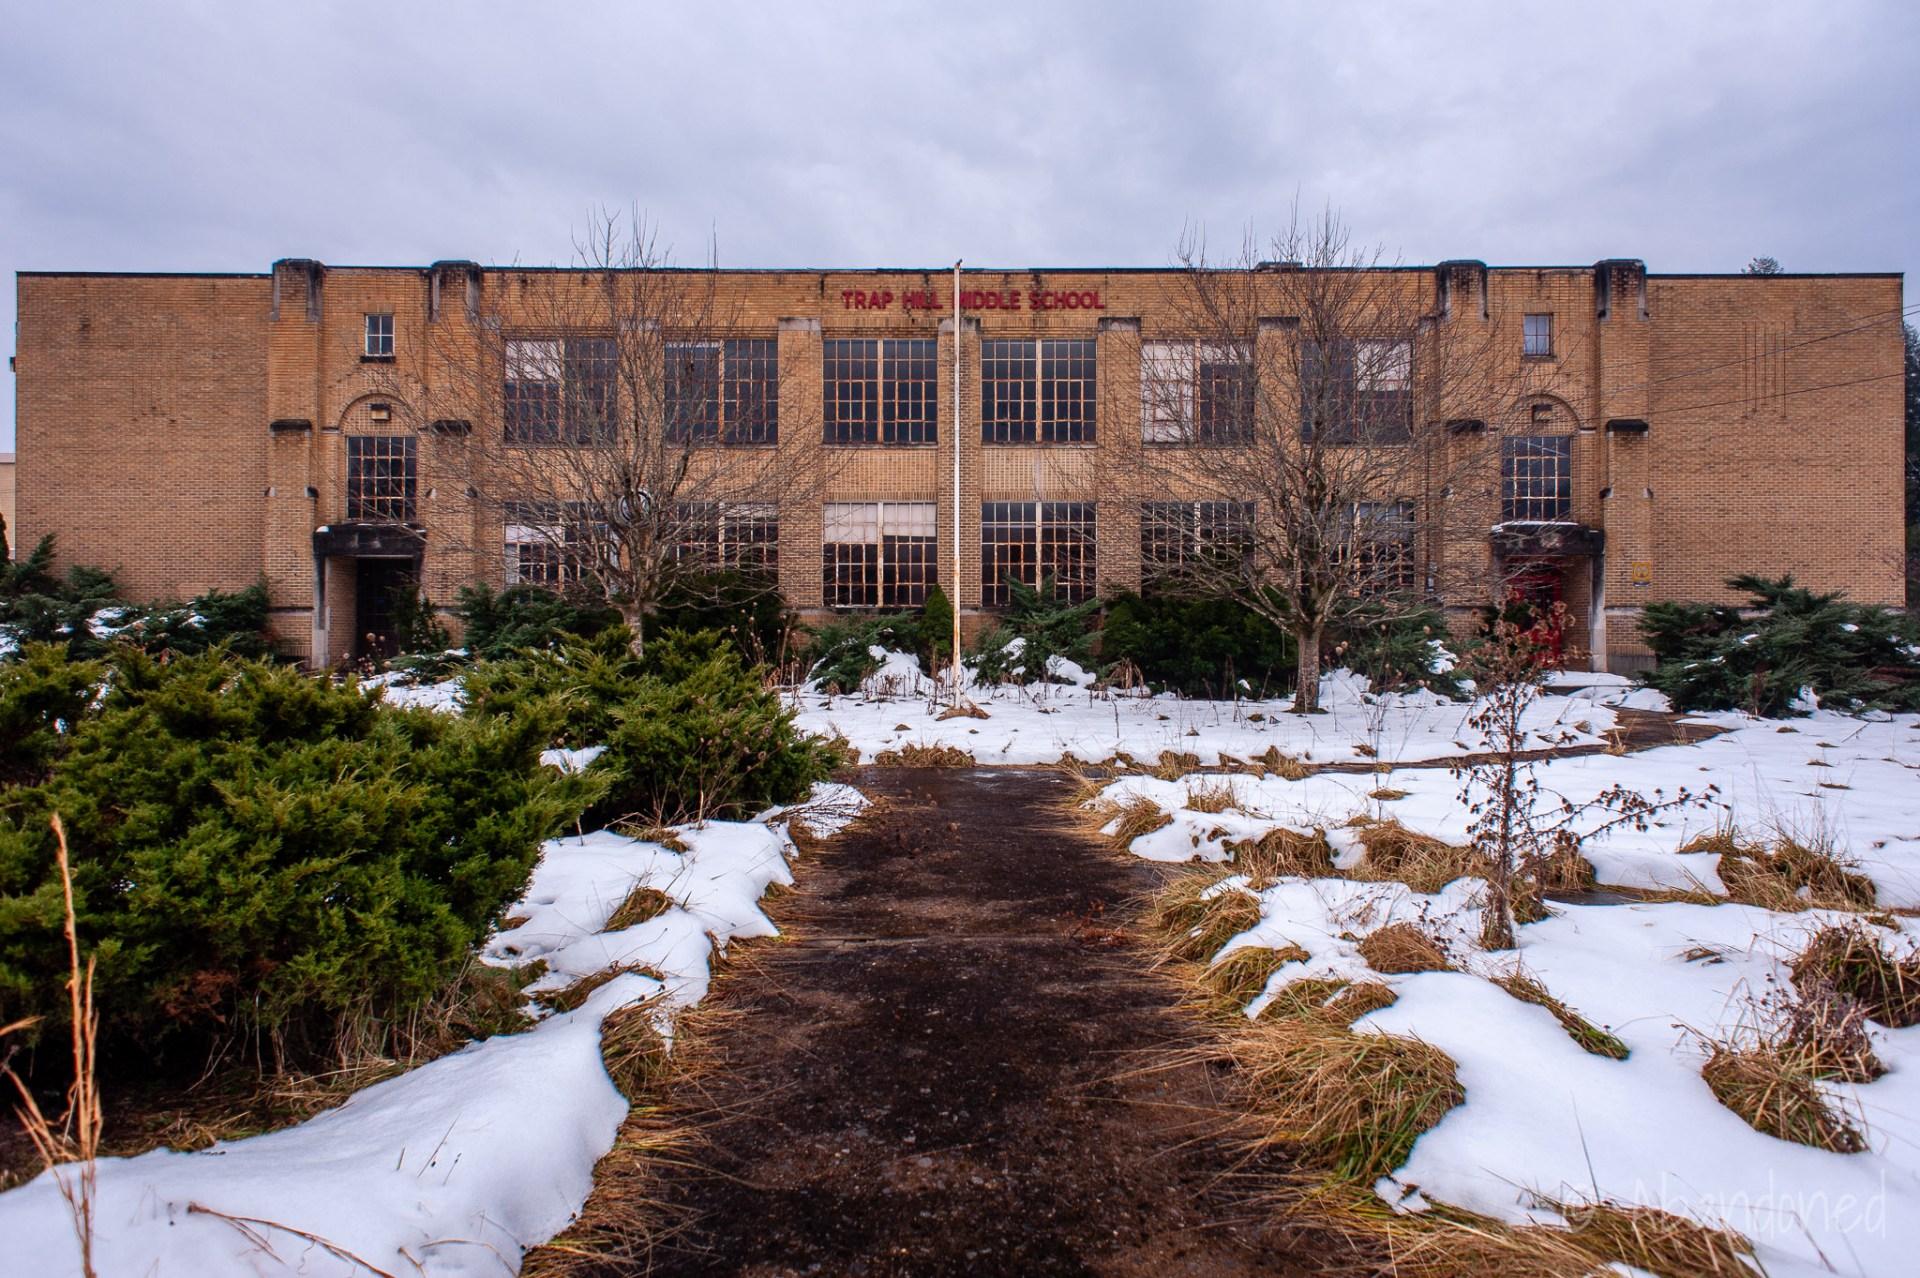 Trap Hill School